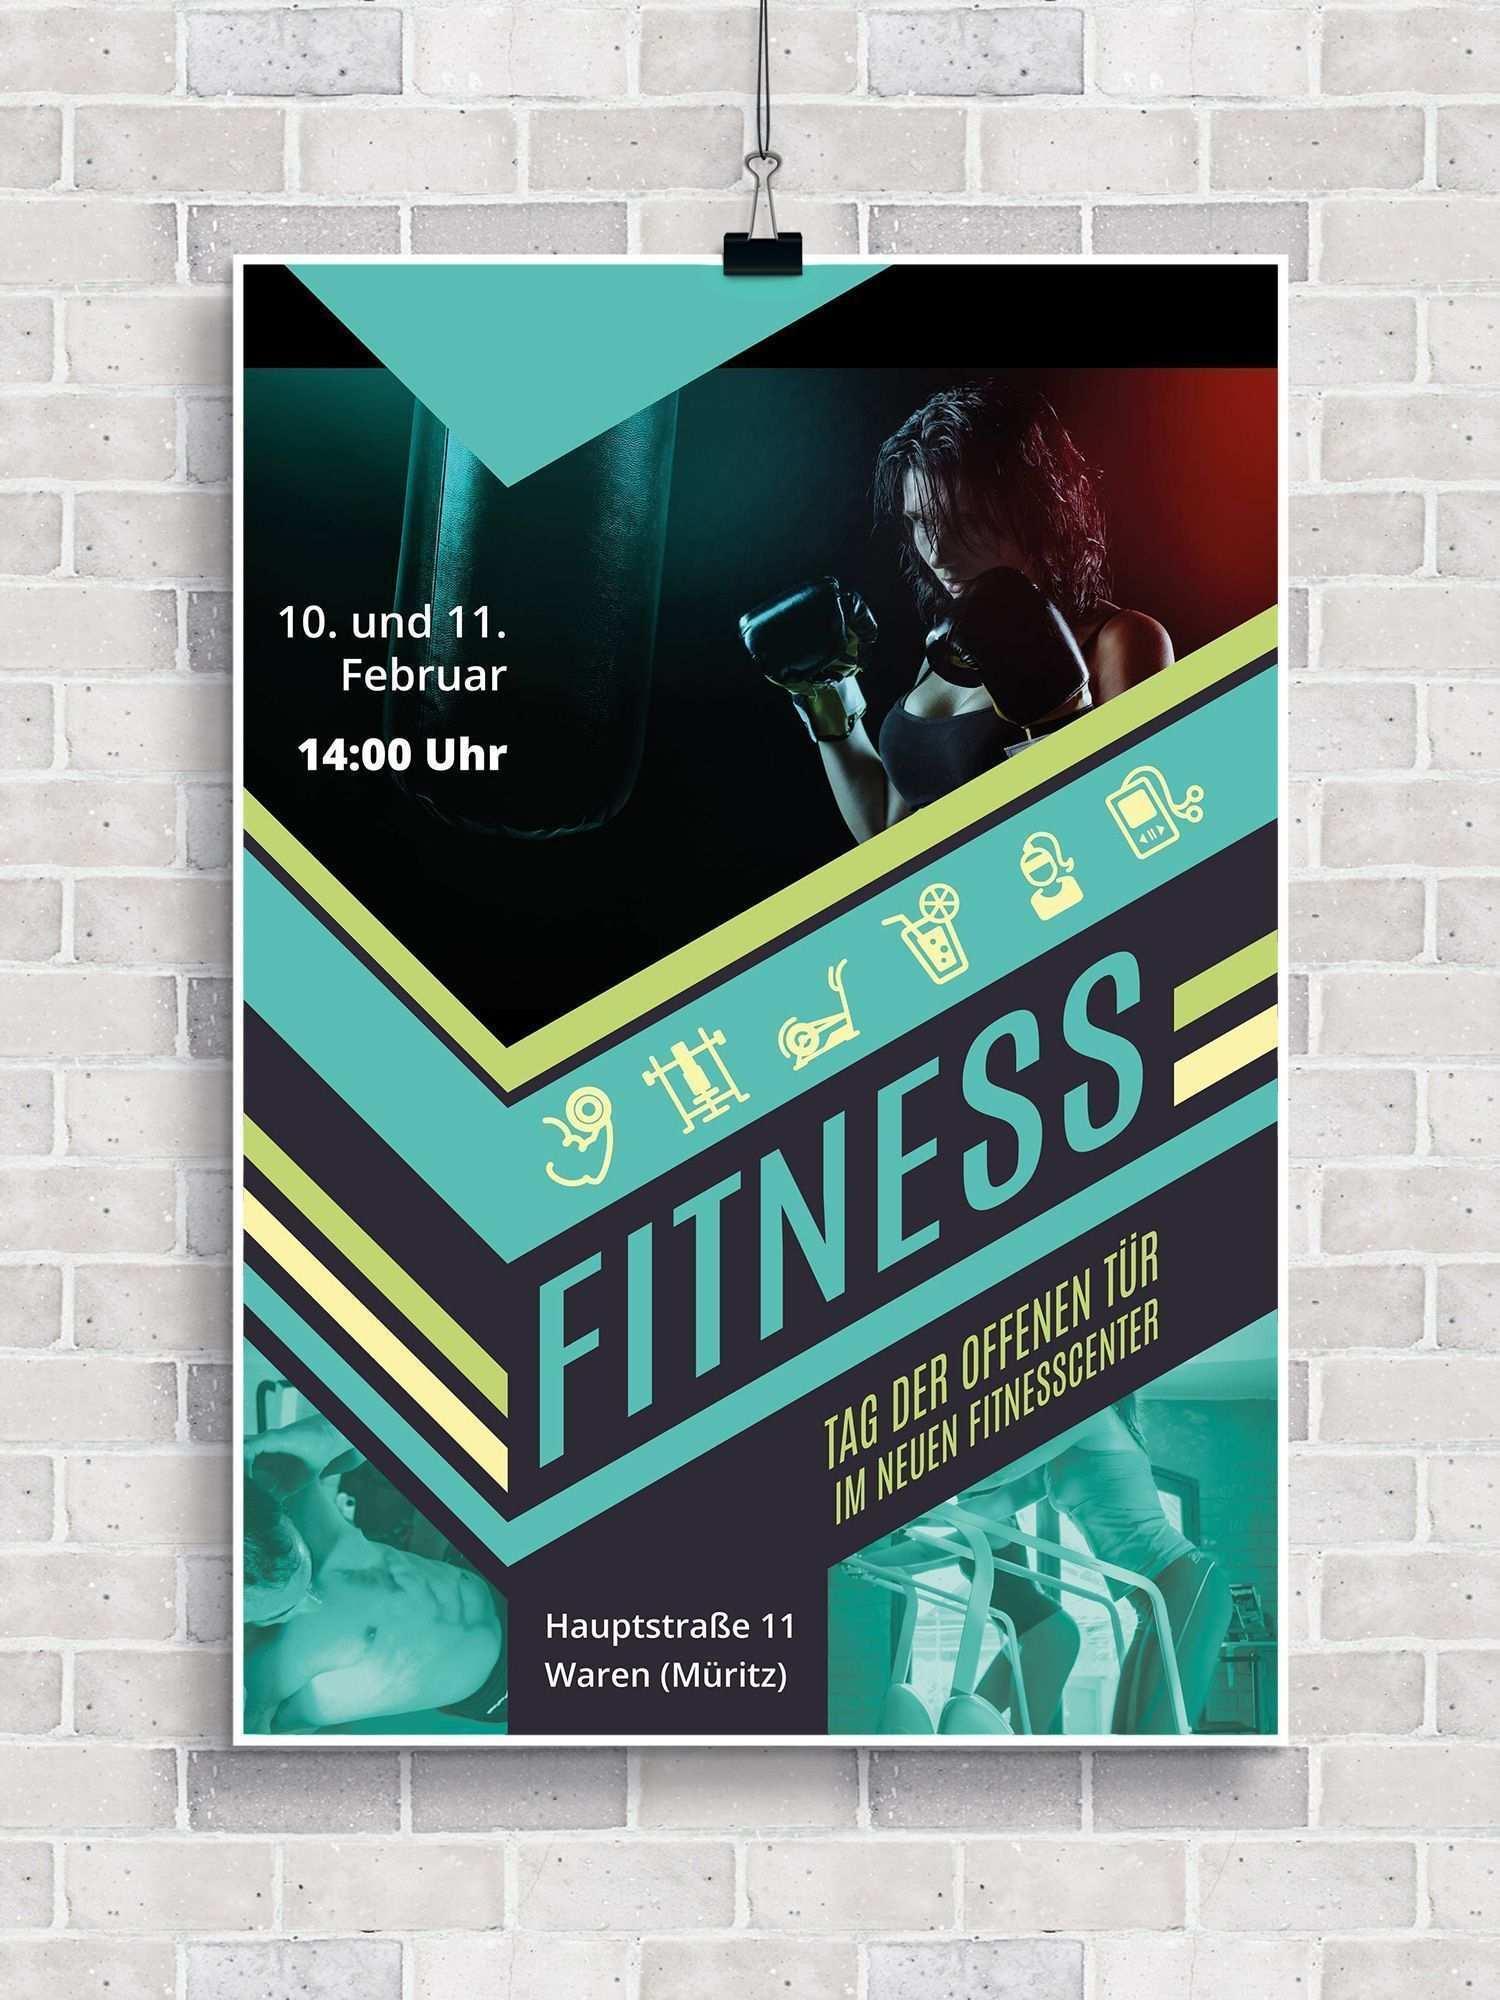 Fitness Fitnessstudio Fitnessstudios Flyervorlagen Fur Langhantel Fitness Probetraining Fitness Fitnessstudios Flyer Sport Poster Design Sport Poster